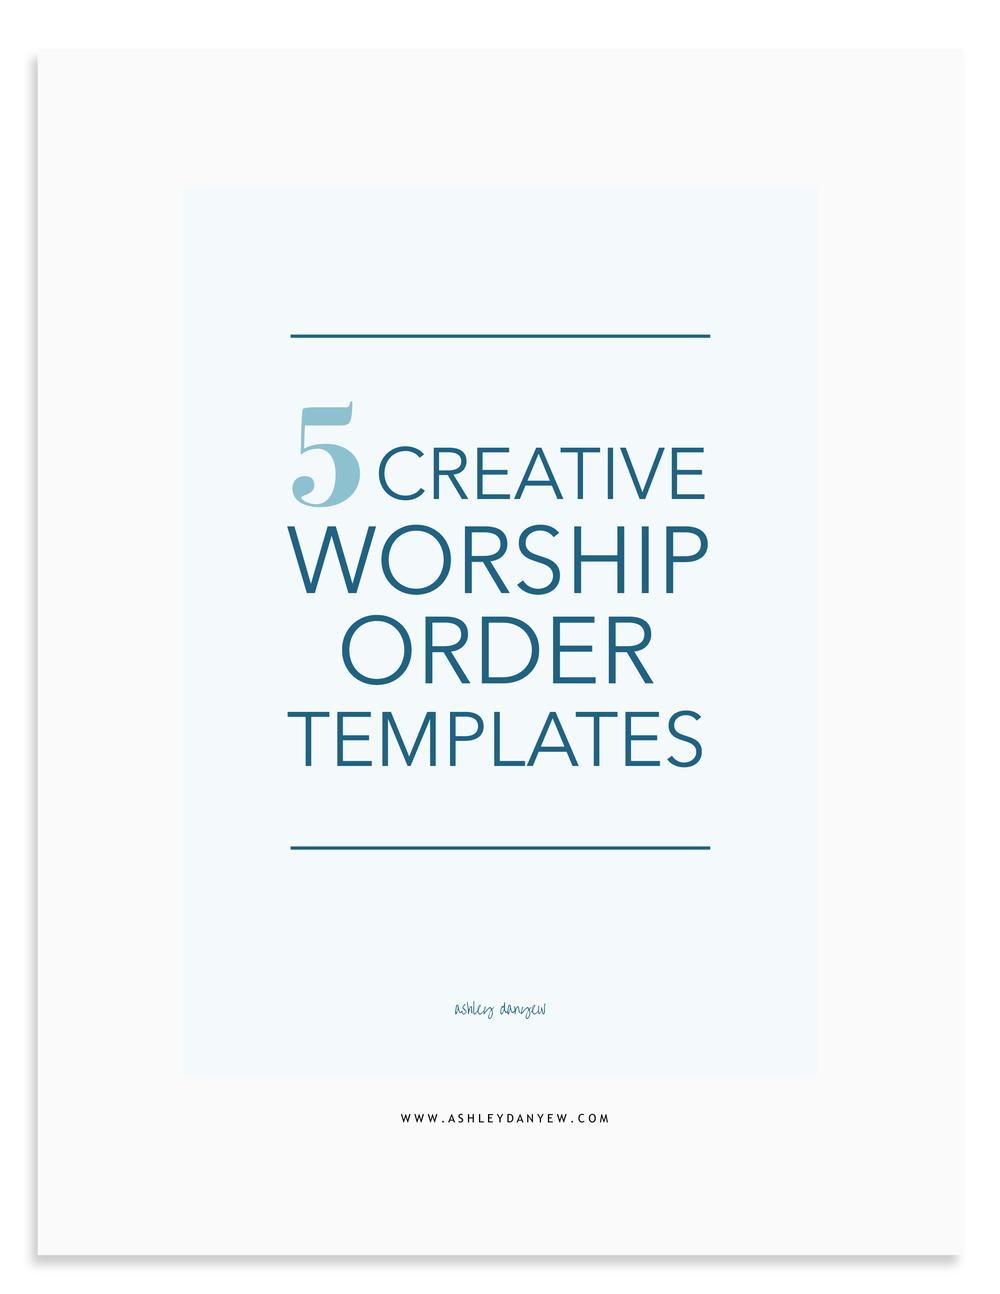 5 Creative Worship Order Templates.png